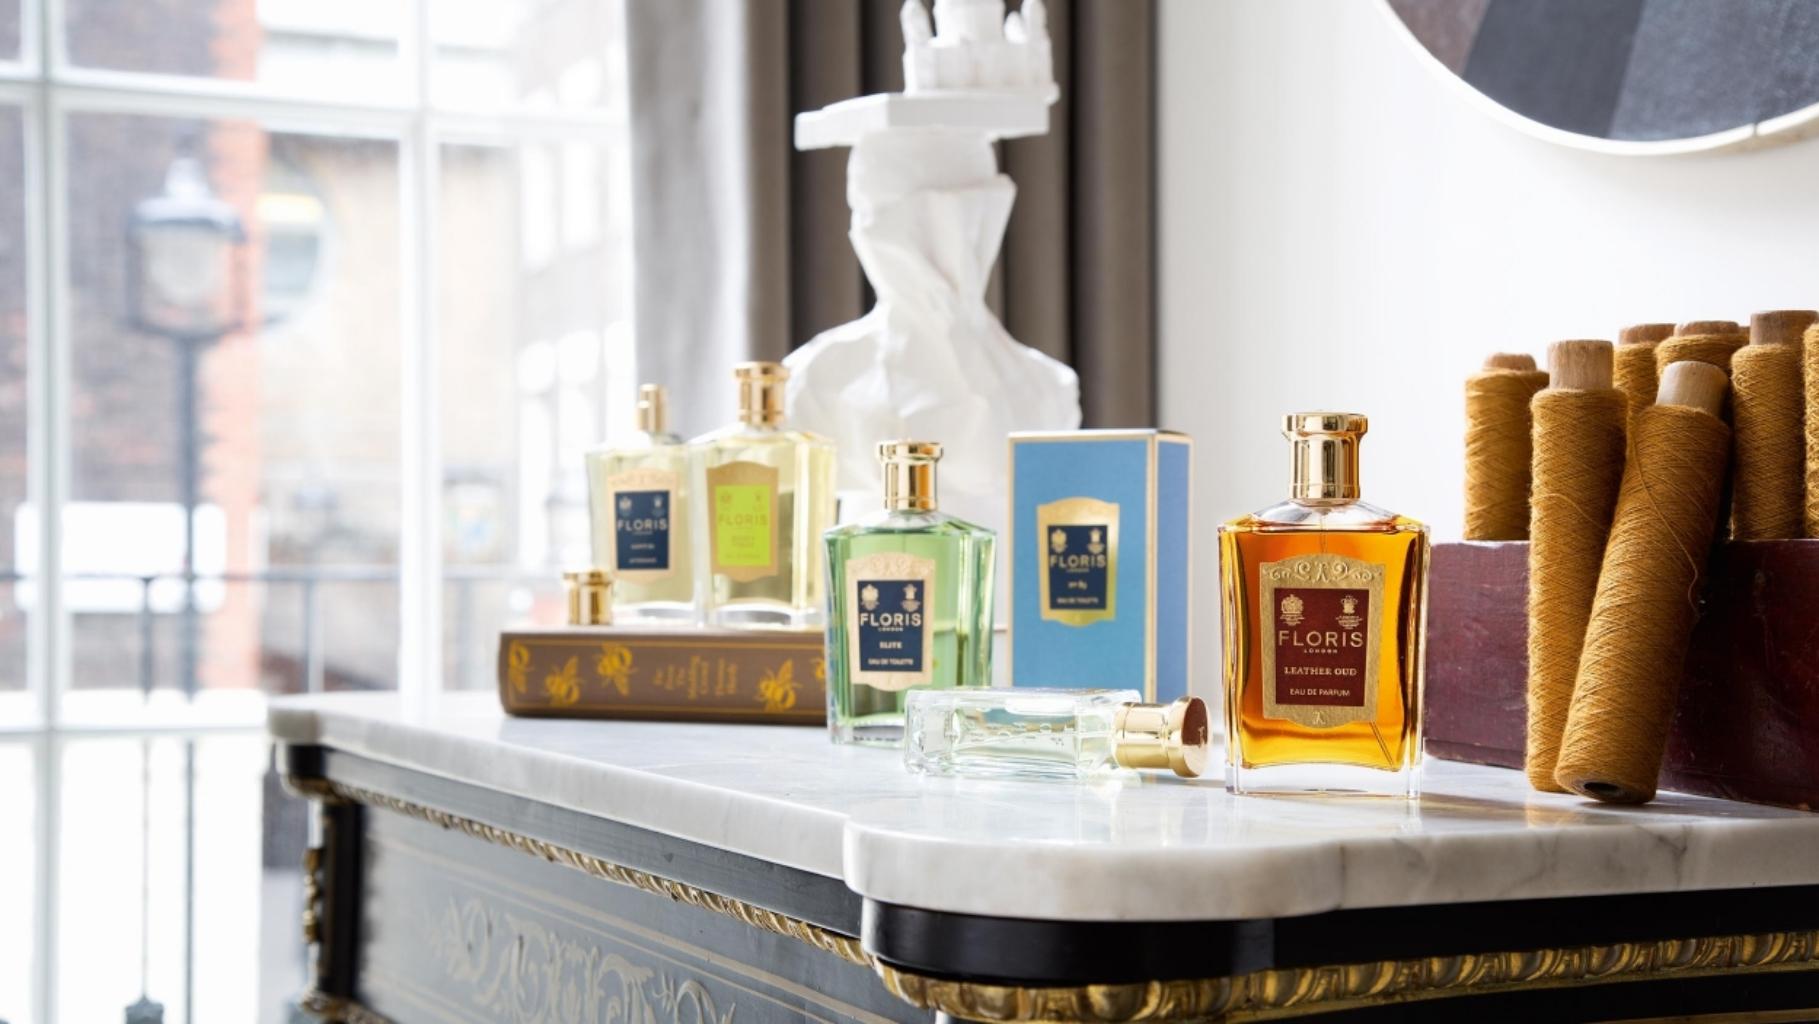 Floris London是英國最古老、世界上第二古老的香水品牌,其悠久歷史堪稱是「香氛界老佛爺」